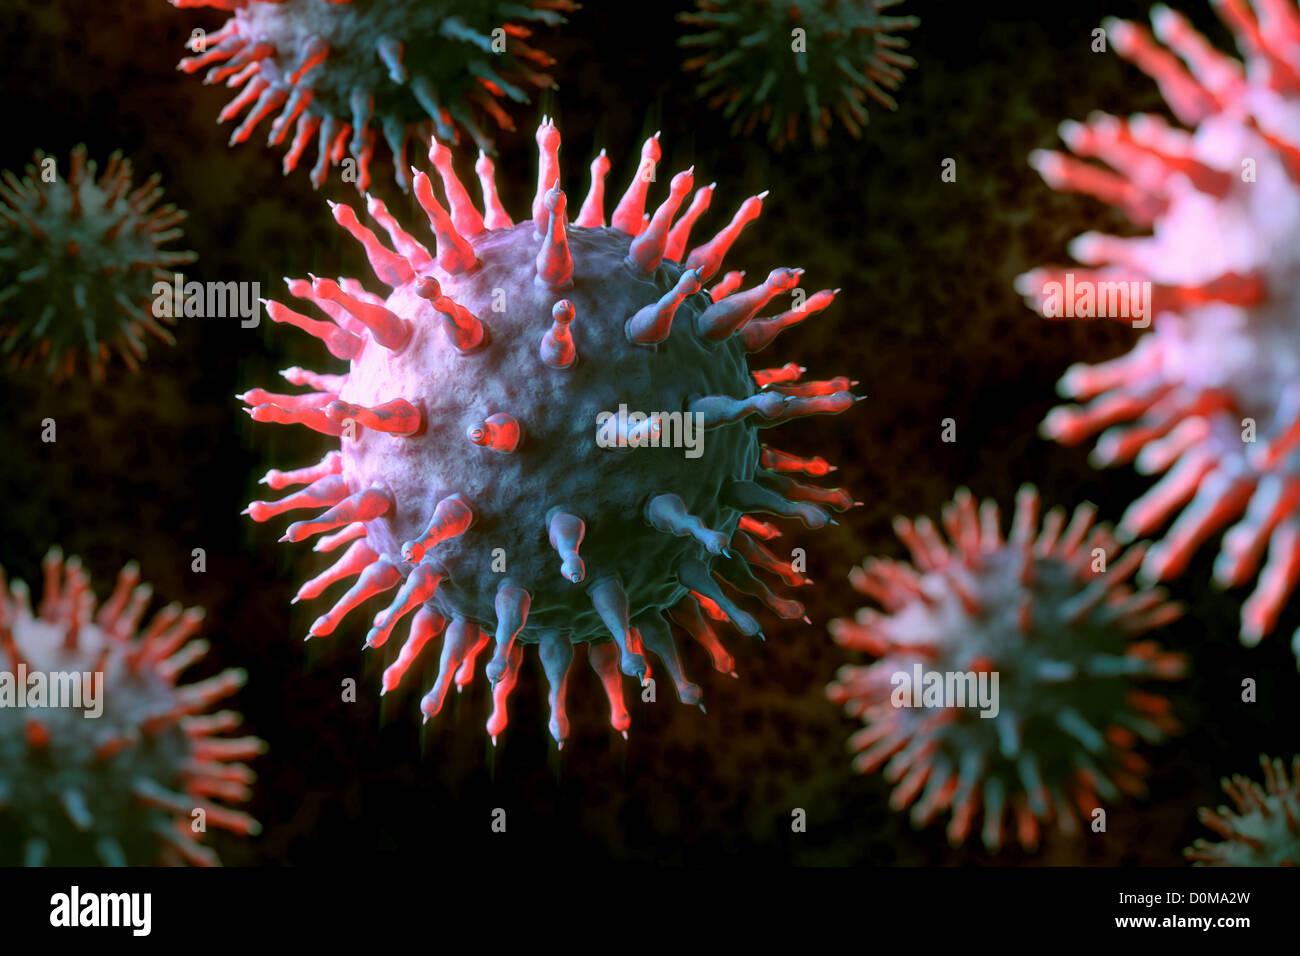 Conceptual visualization of the Swine influenza Virus (H1N1). - Stock Image